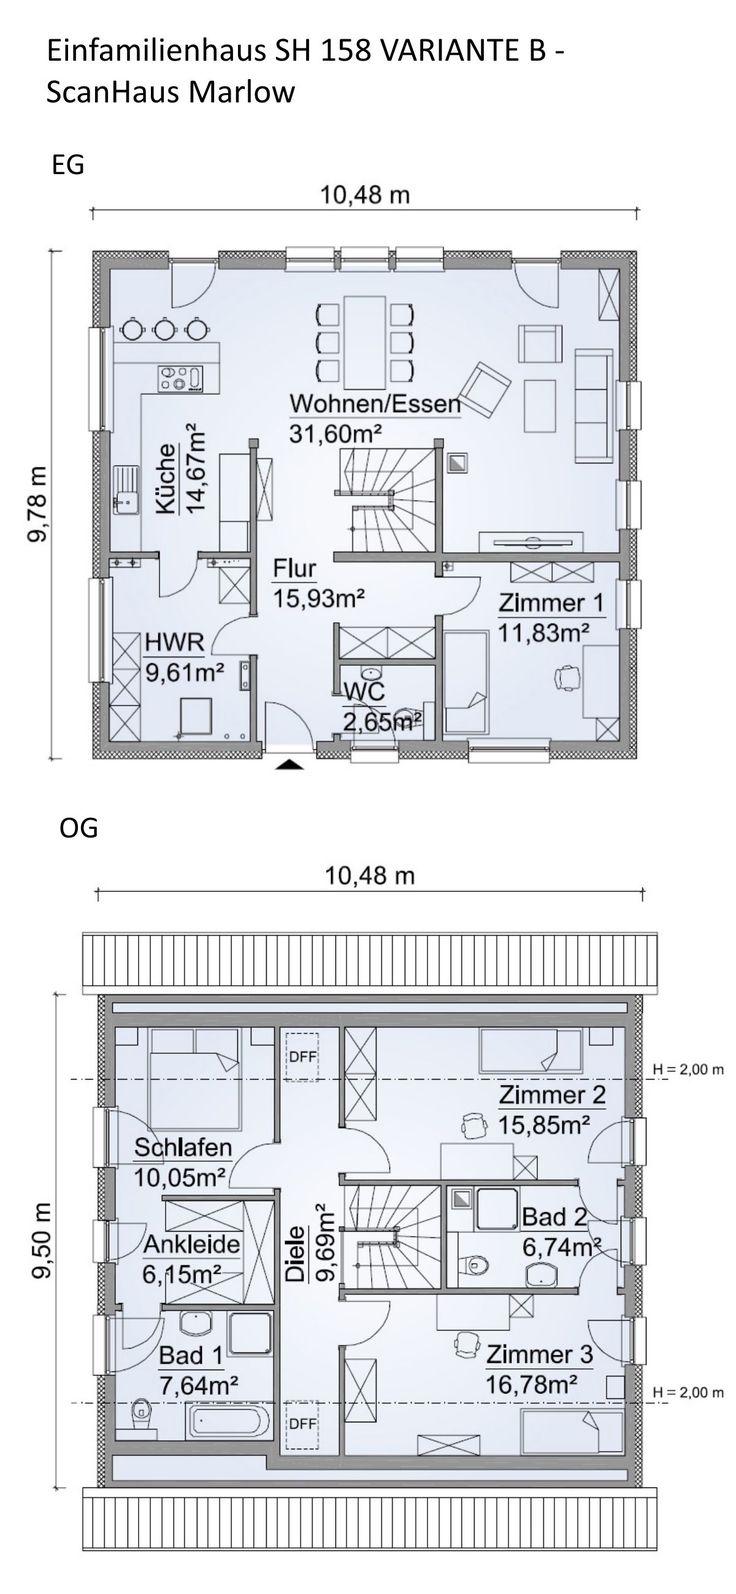 Grundriss Einfamilienhaus modern mit Satteldach Architektur – 5 Zimmer, 160 m², Erdgeschoss Treppe offen, Wohnküche, Obergeschoss – Haus bauen Ideen…